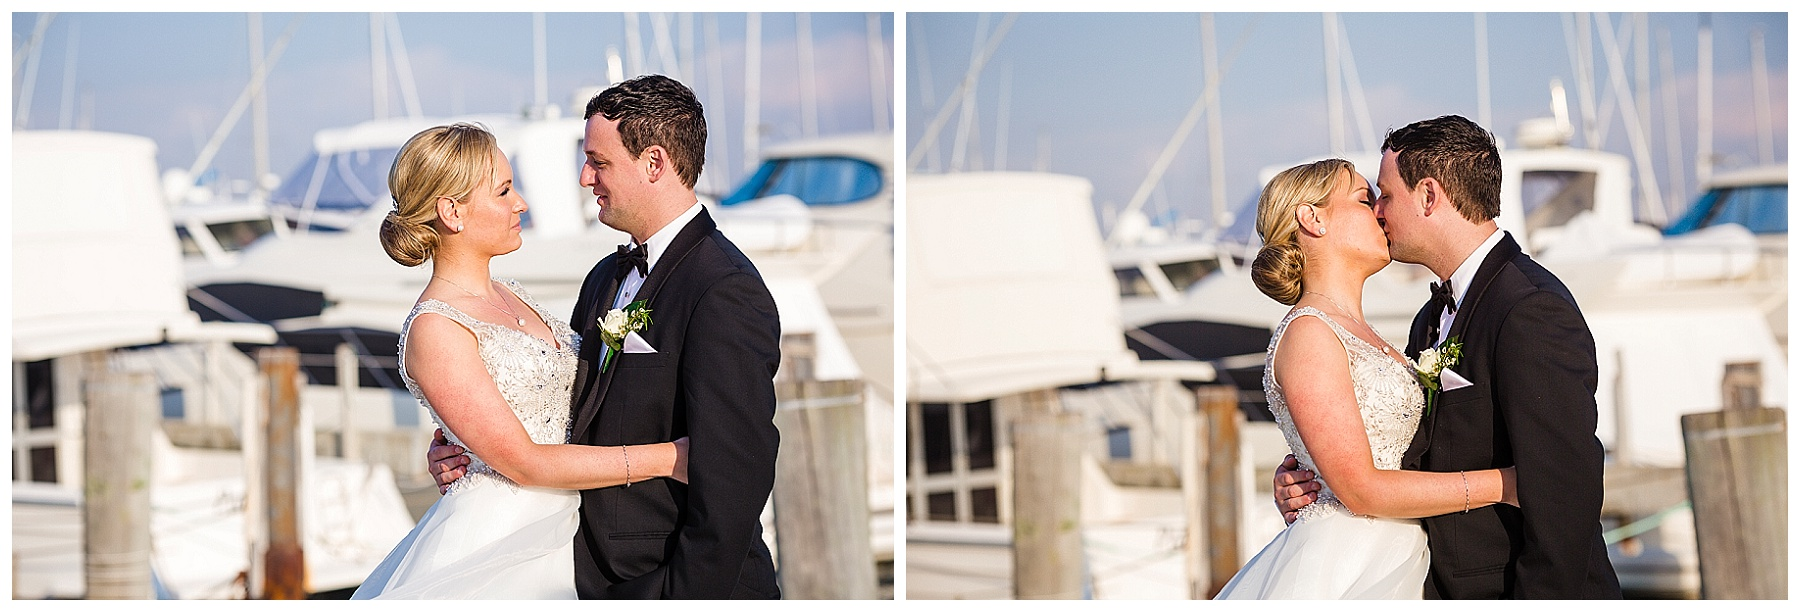 Hillarys Harbour wedding photo